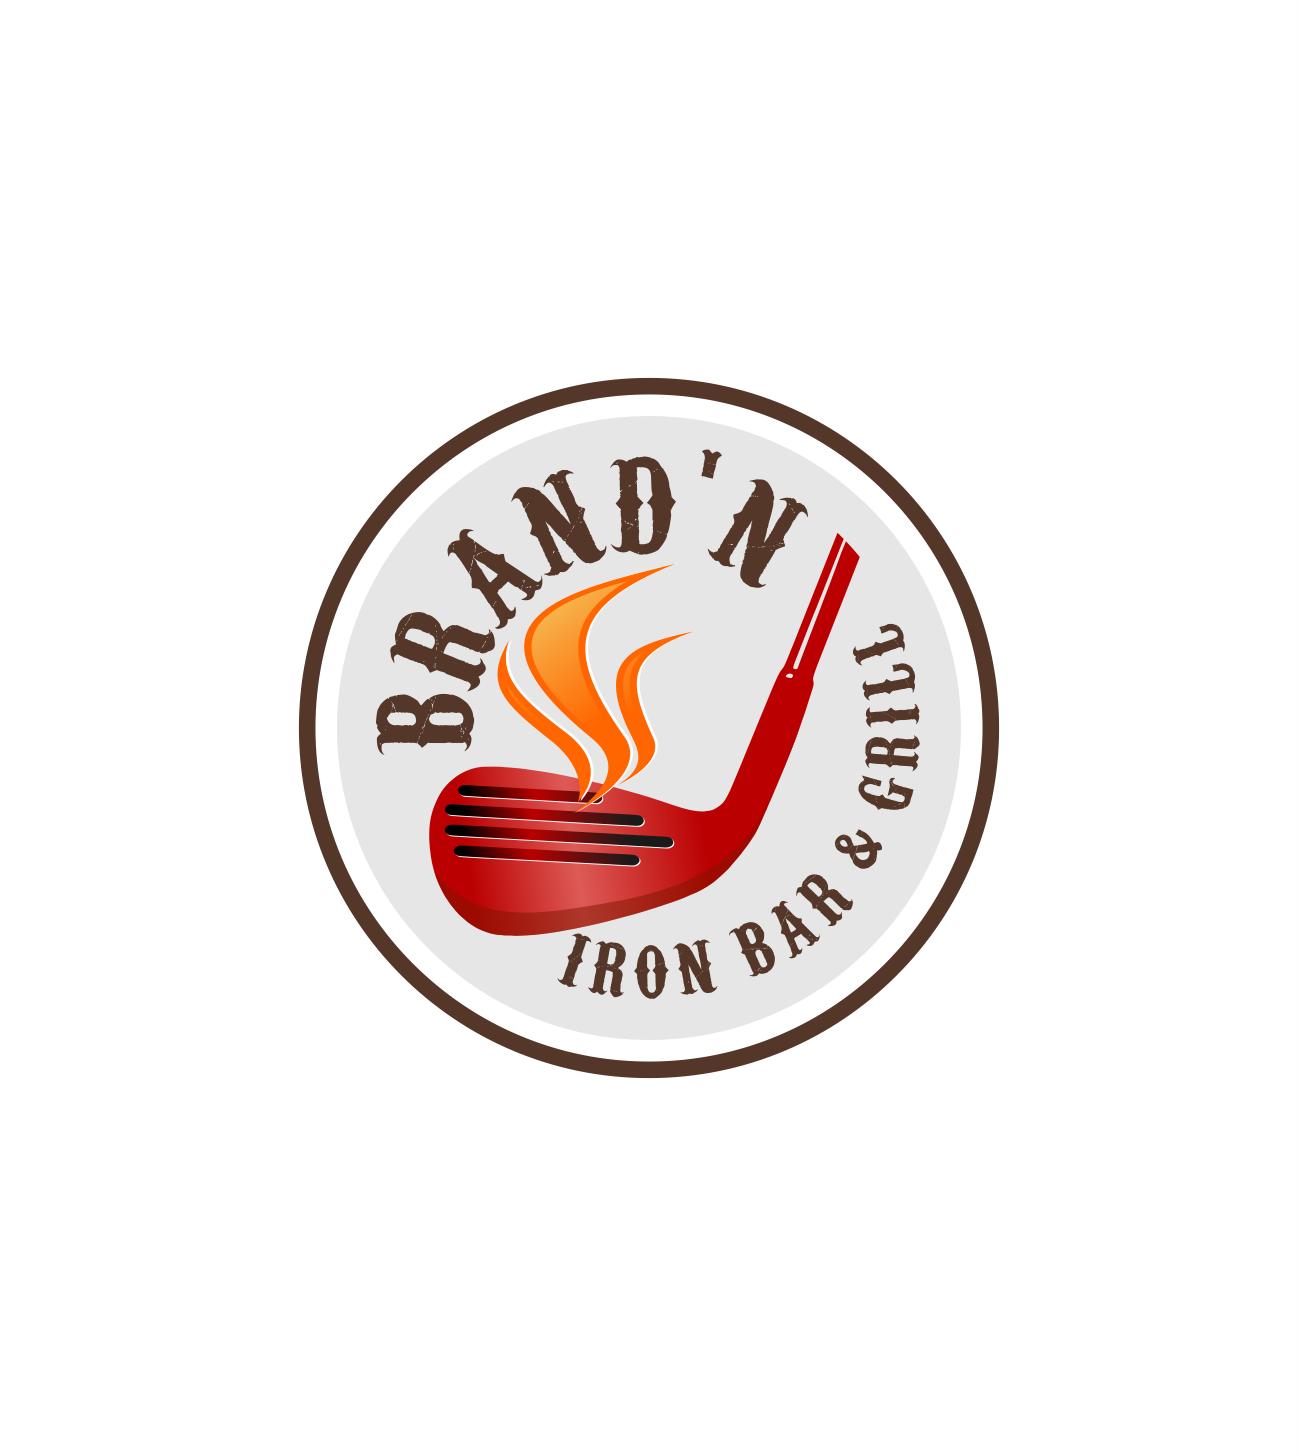 Logo Design by Raymond Garcia - Entry No. 223 in the Logo Design Contest Captivating Logo Design for Brand'n Iron Bar & Grill.